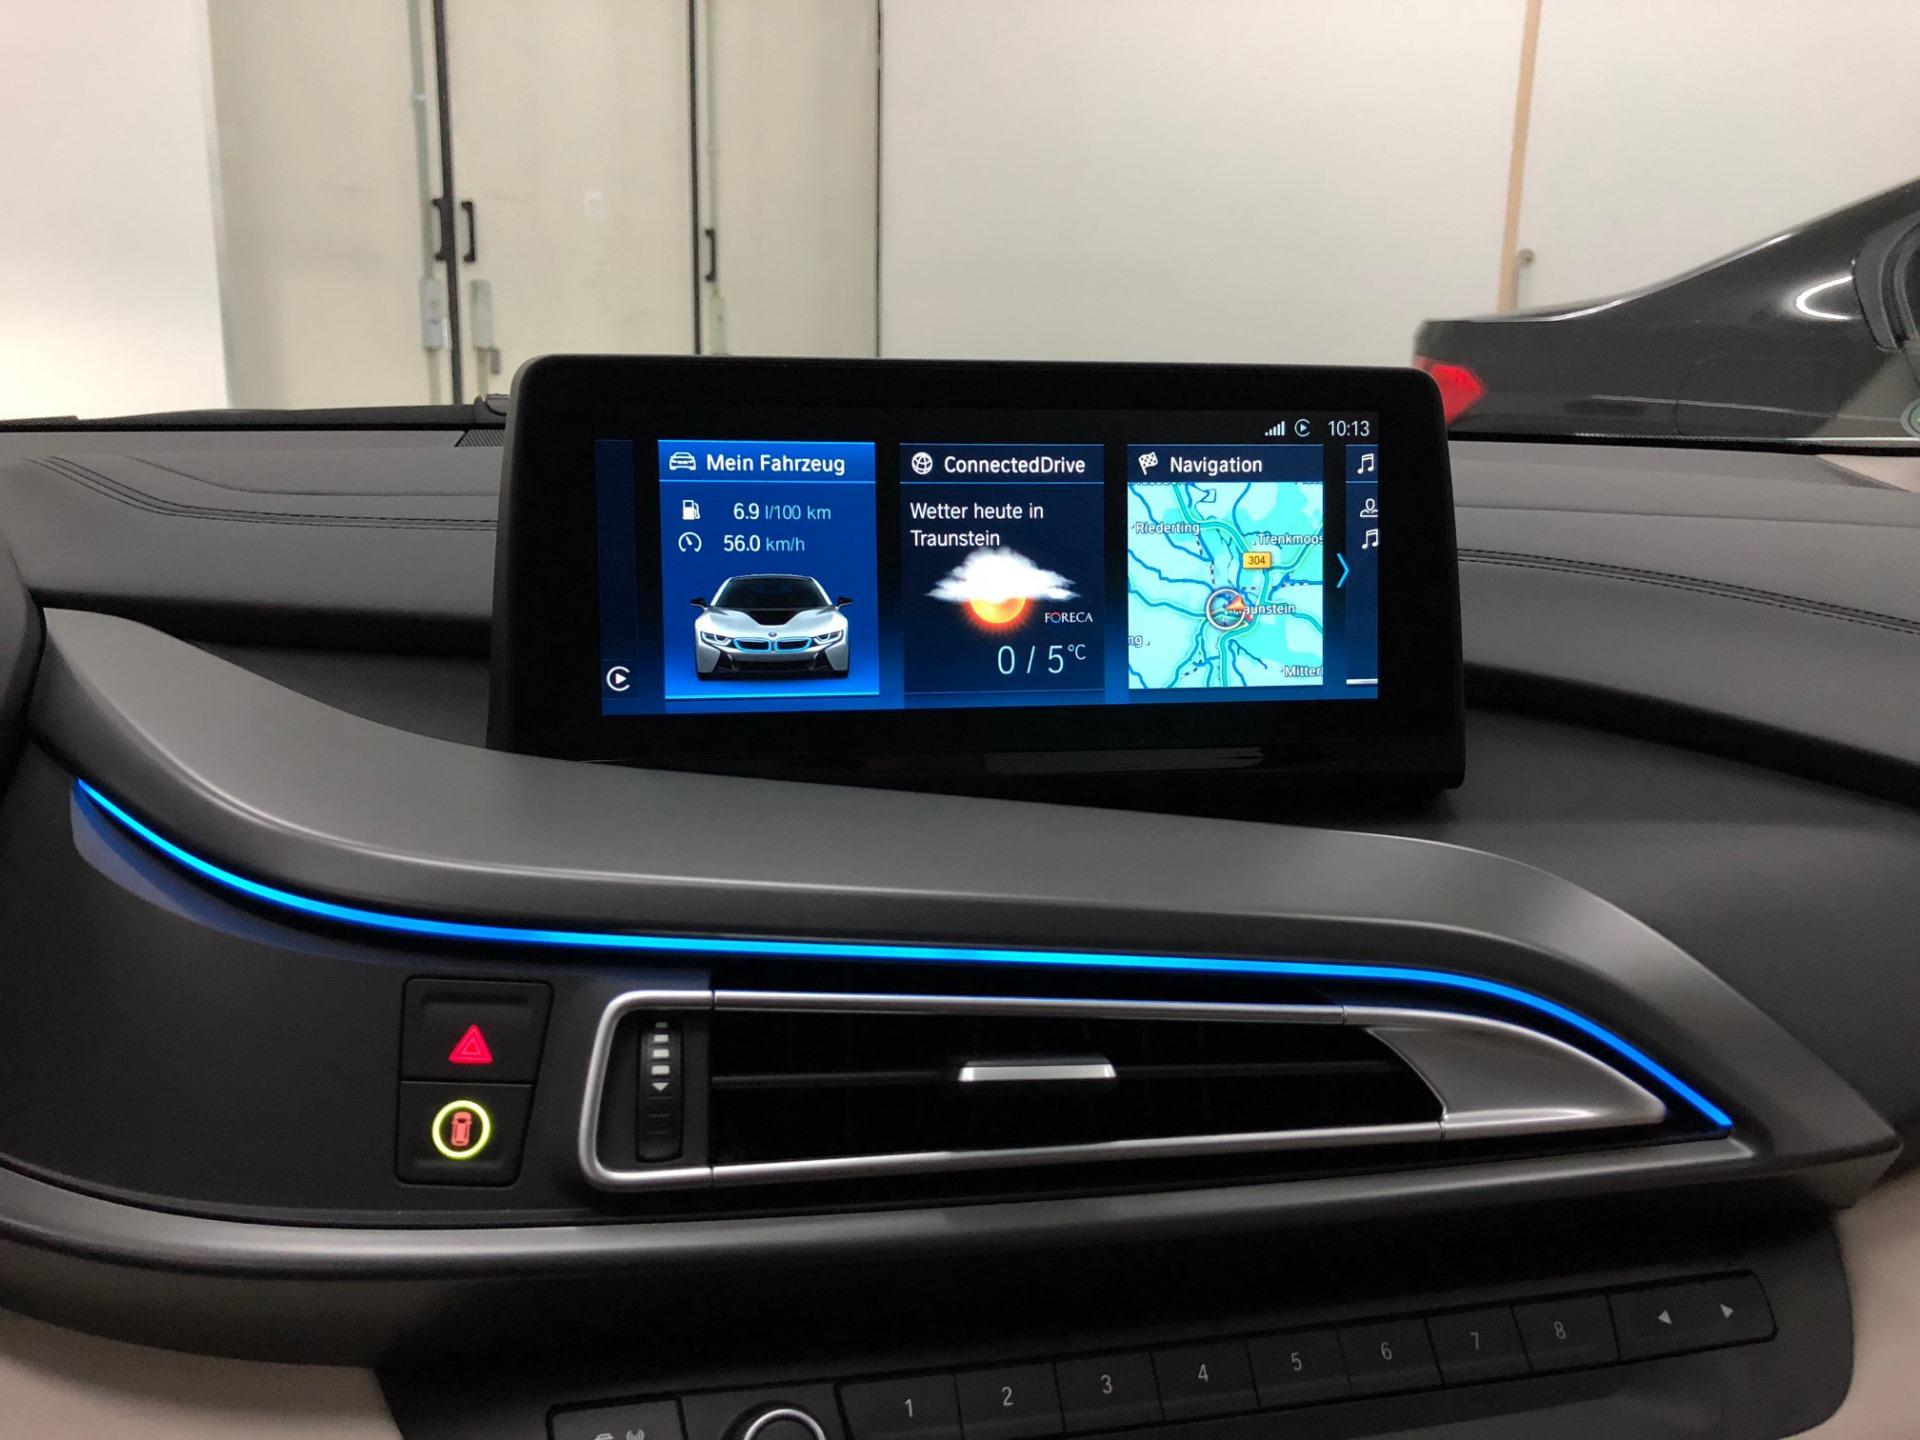 BMW i8 iDrive ID6 Umbau 2018 Infotainment Bimmer Manufaktur 01